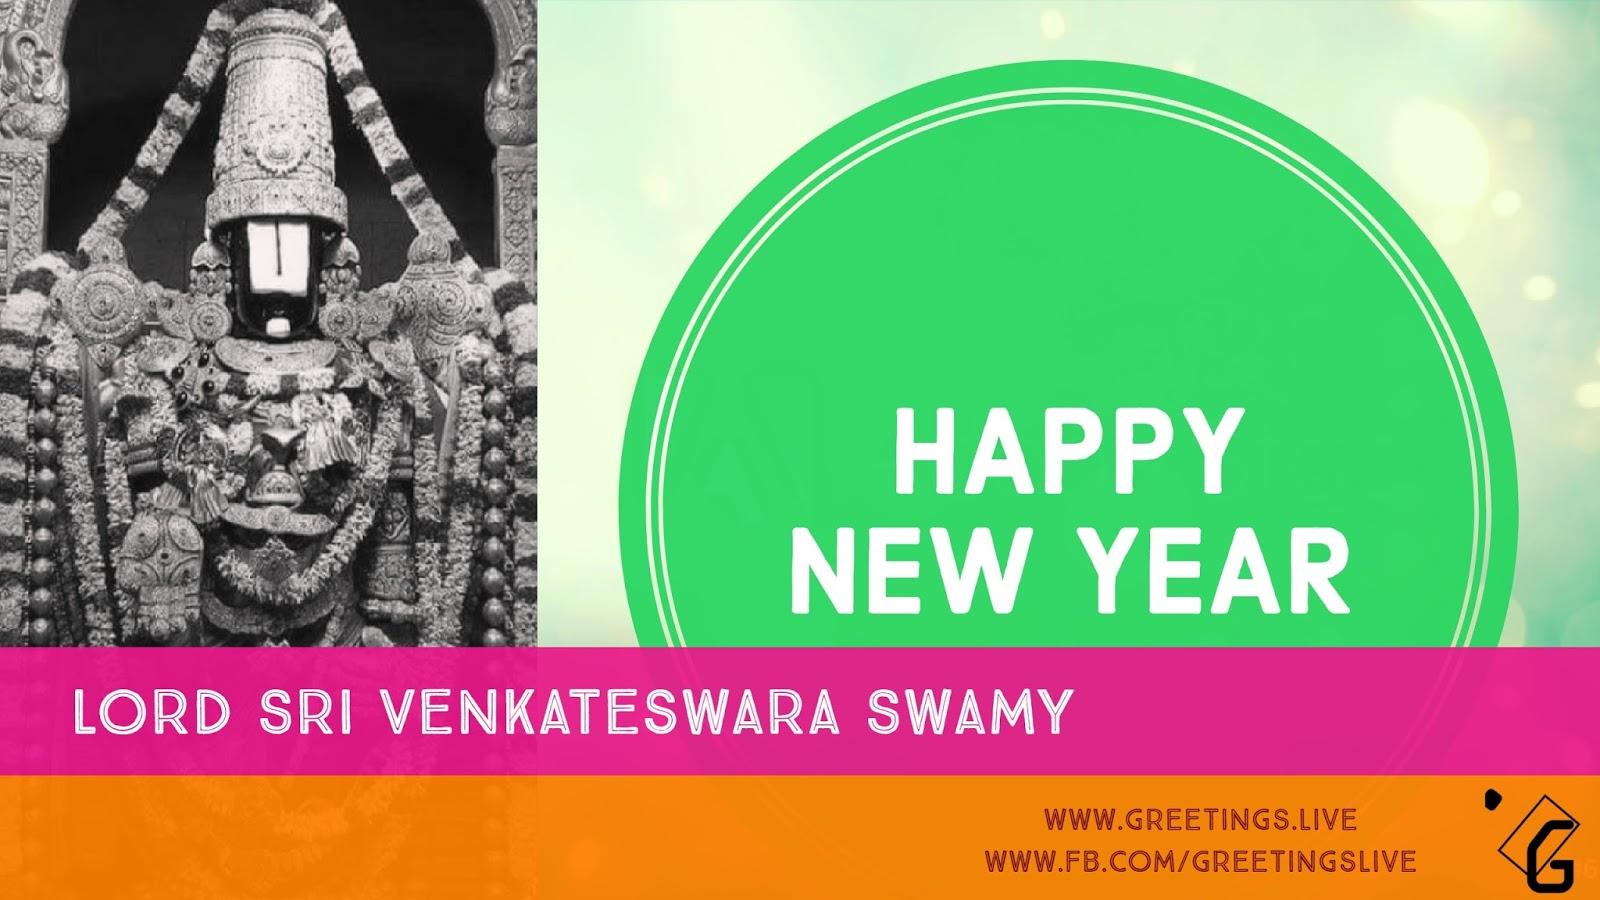 Lord Sri Venkateswara Swamy Sri Venkateswara New Year Greetings Hd